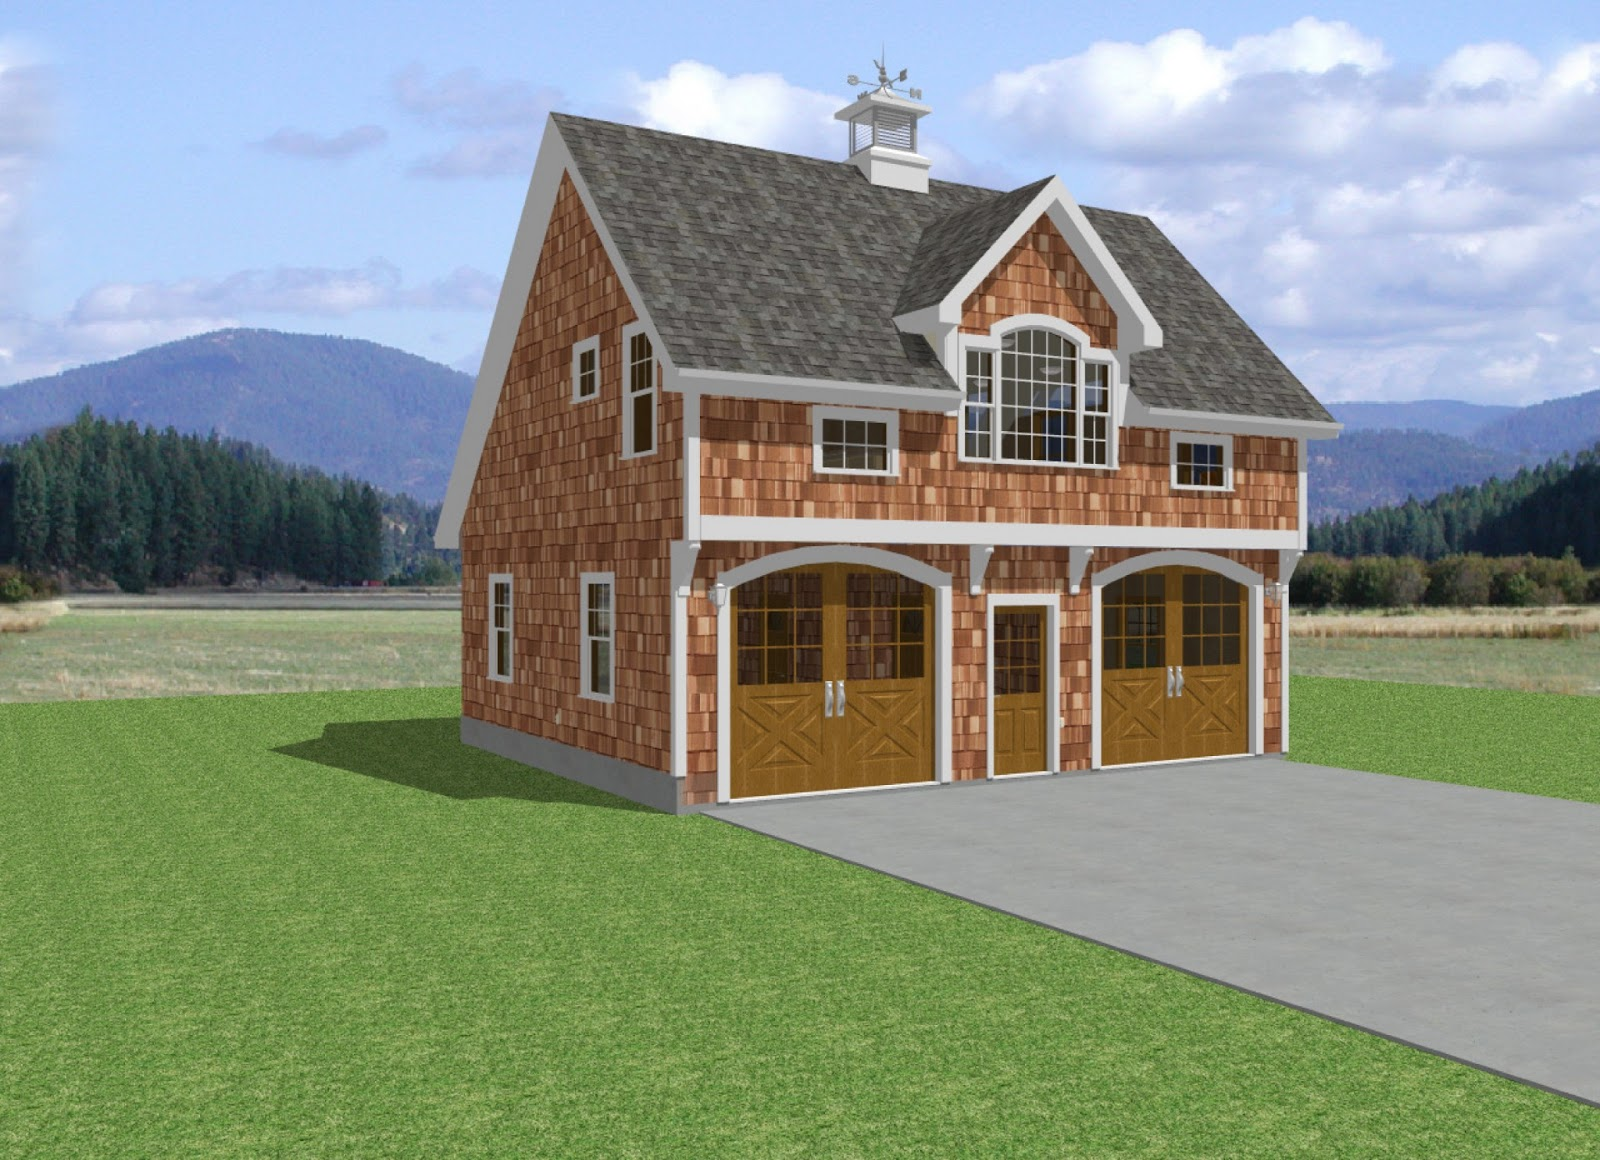 Modular home builder huntington homes of vt builds new for Modular carriage house